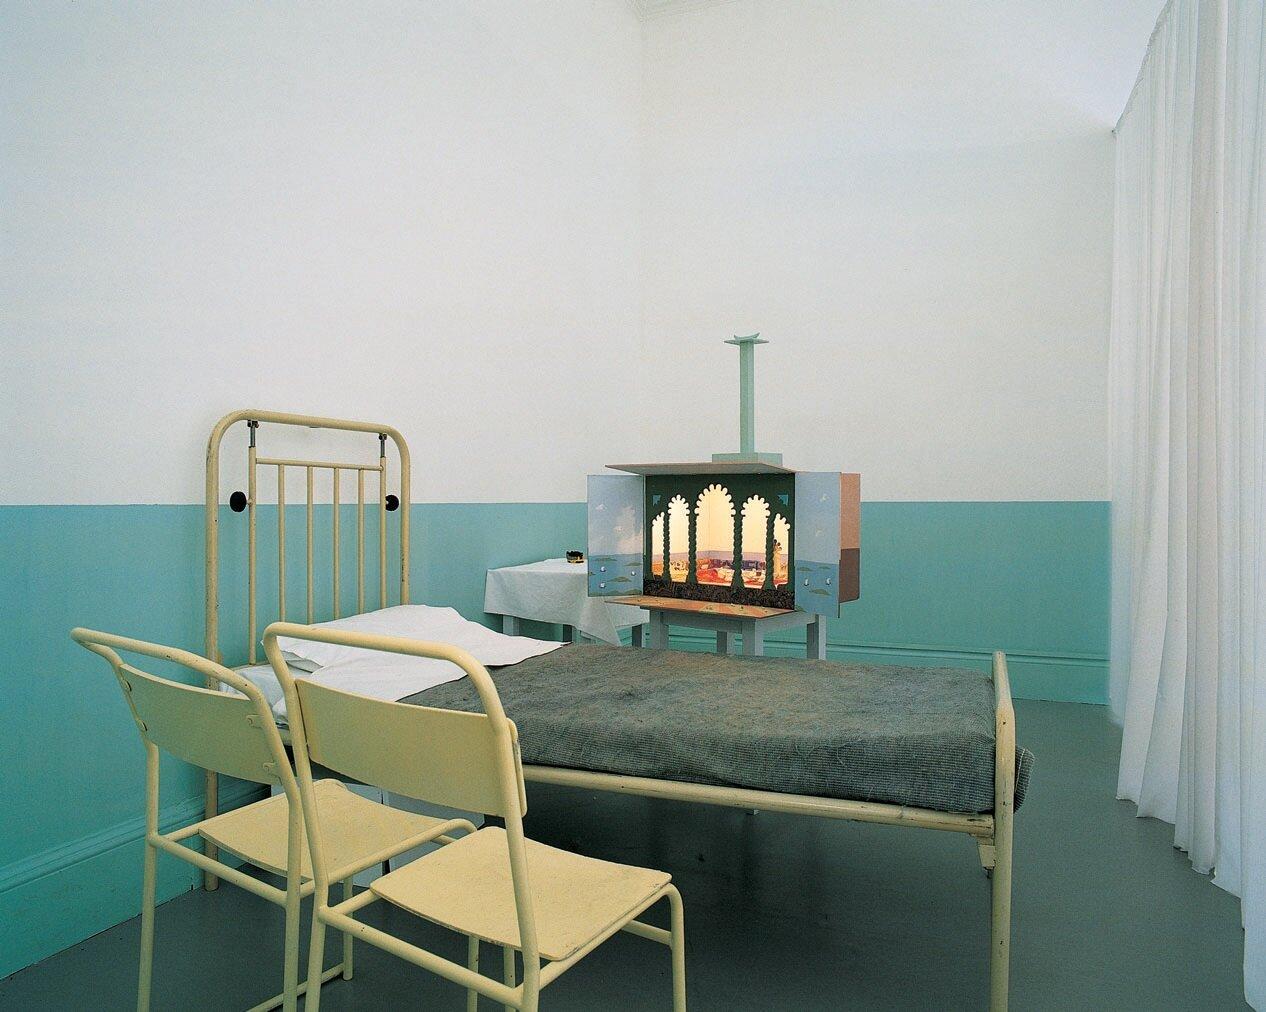 View-of-installation-'An-Earthquake-in-the-Seraglio'-Irish-Museum-of-Modern-Art-Dublin.jpg